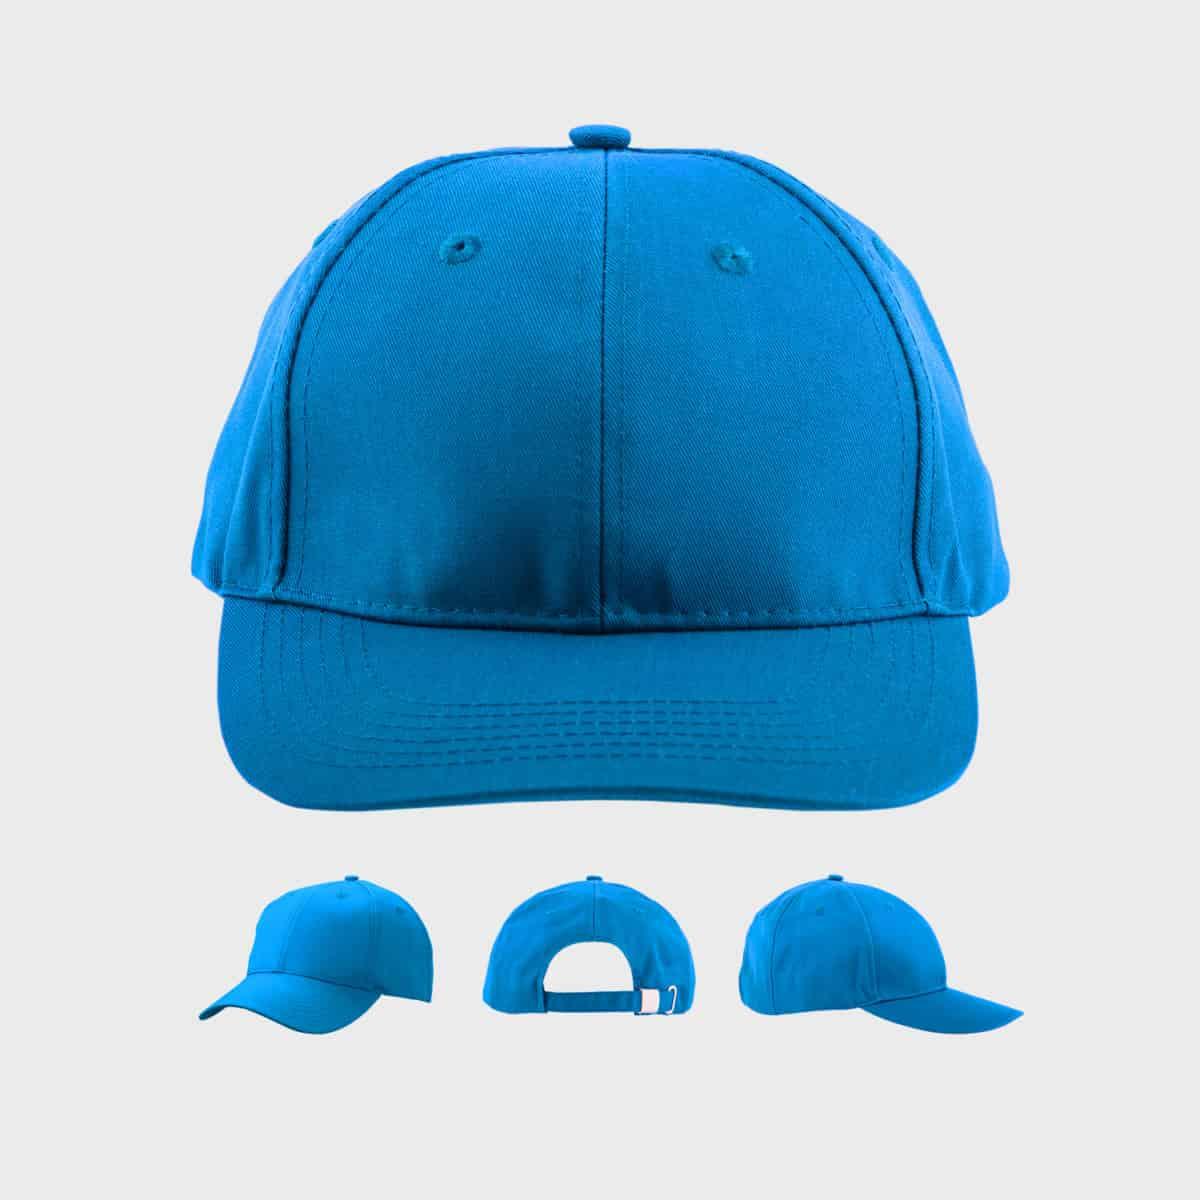 6-Panel-Workwear-Cap-Atlantic-kaufen-besticken_StickManufaktur